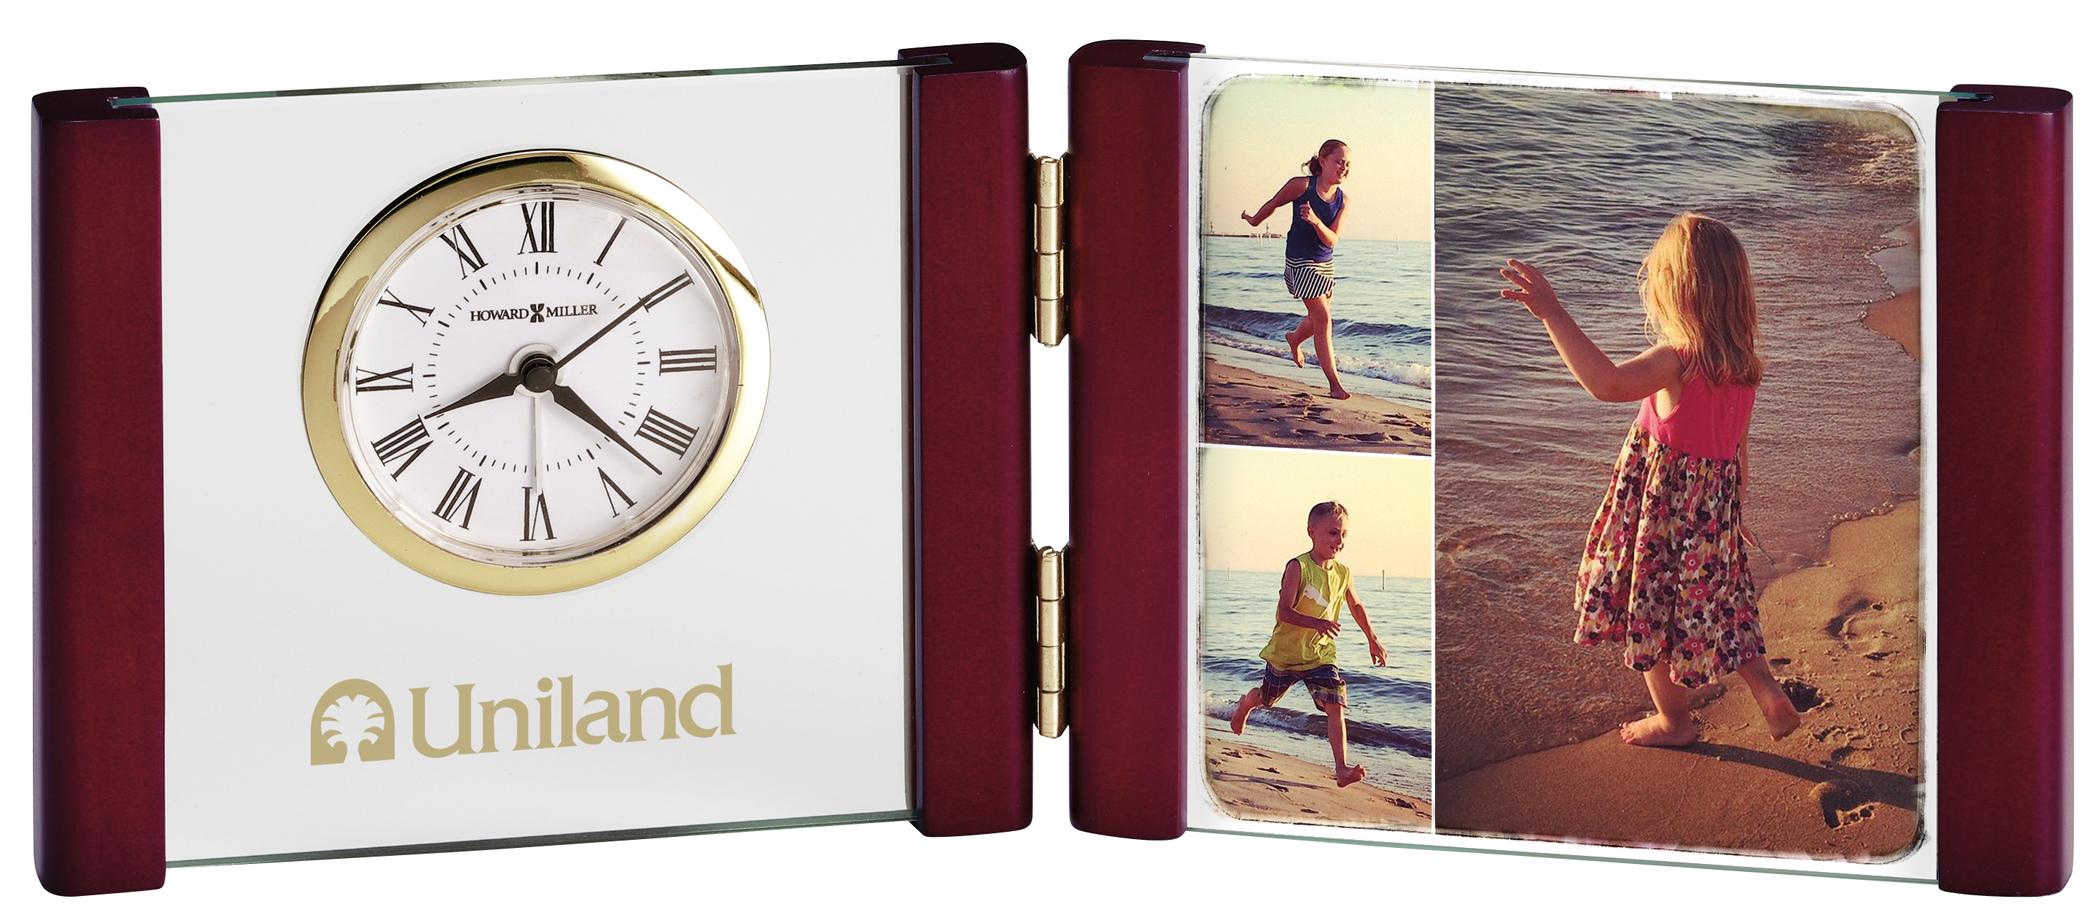 Uniland golf promotional giveaways